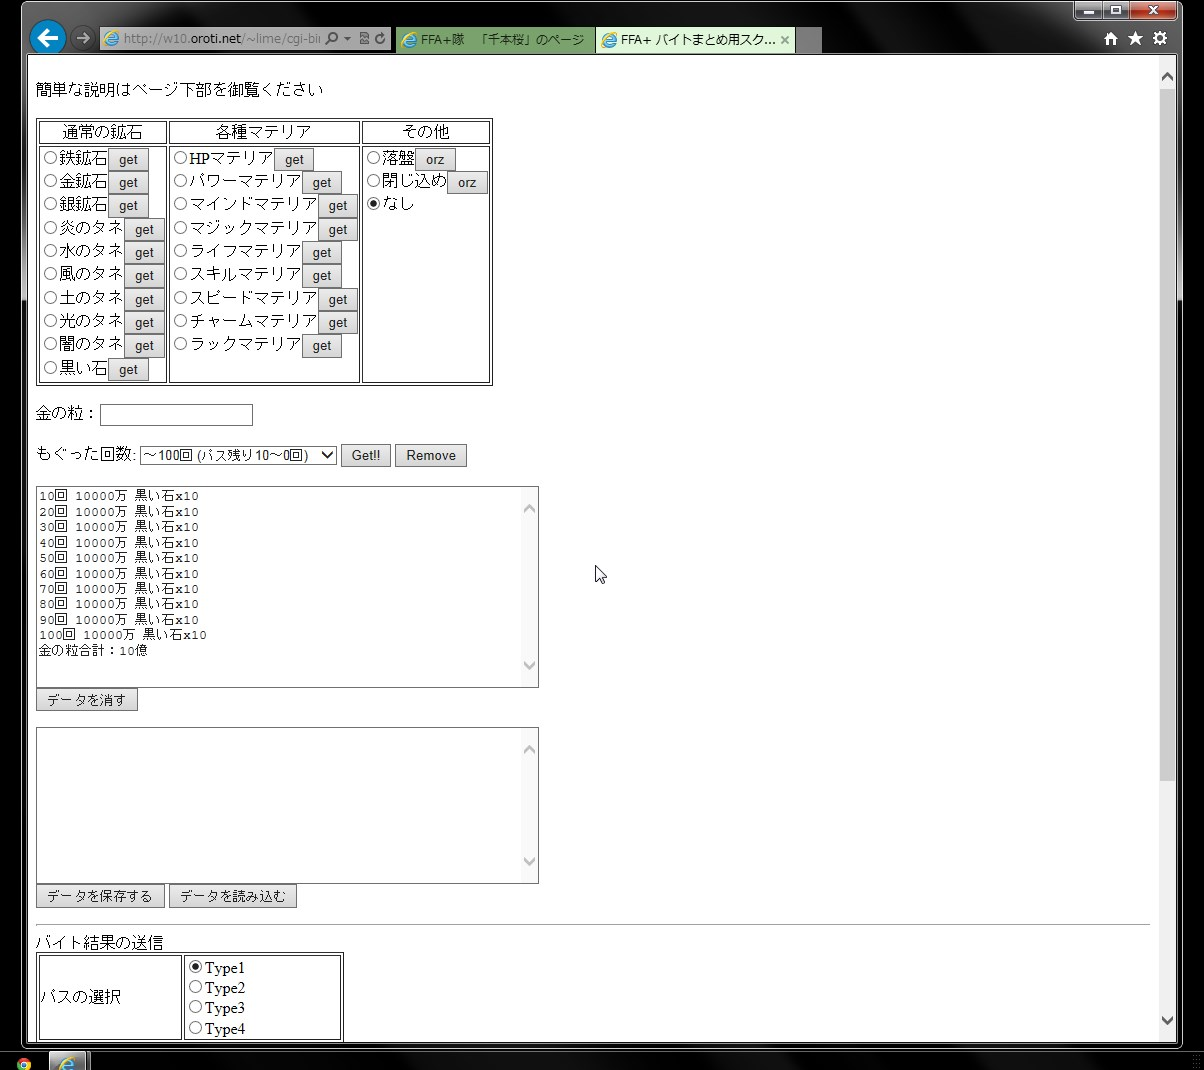 SnapCrab_FFA+ バイトまとめ用スクリプト - あったらいいなこんなパス